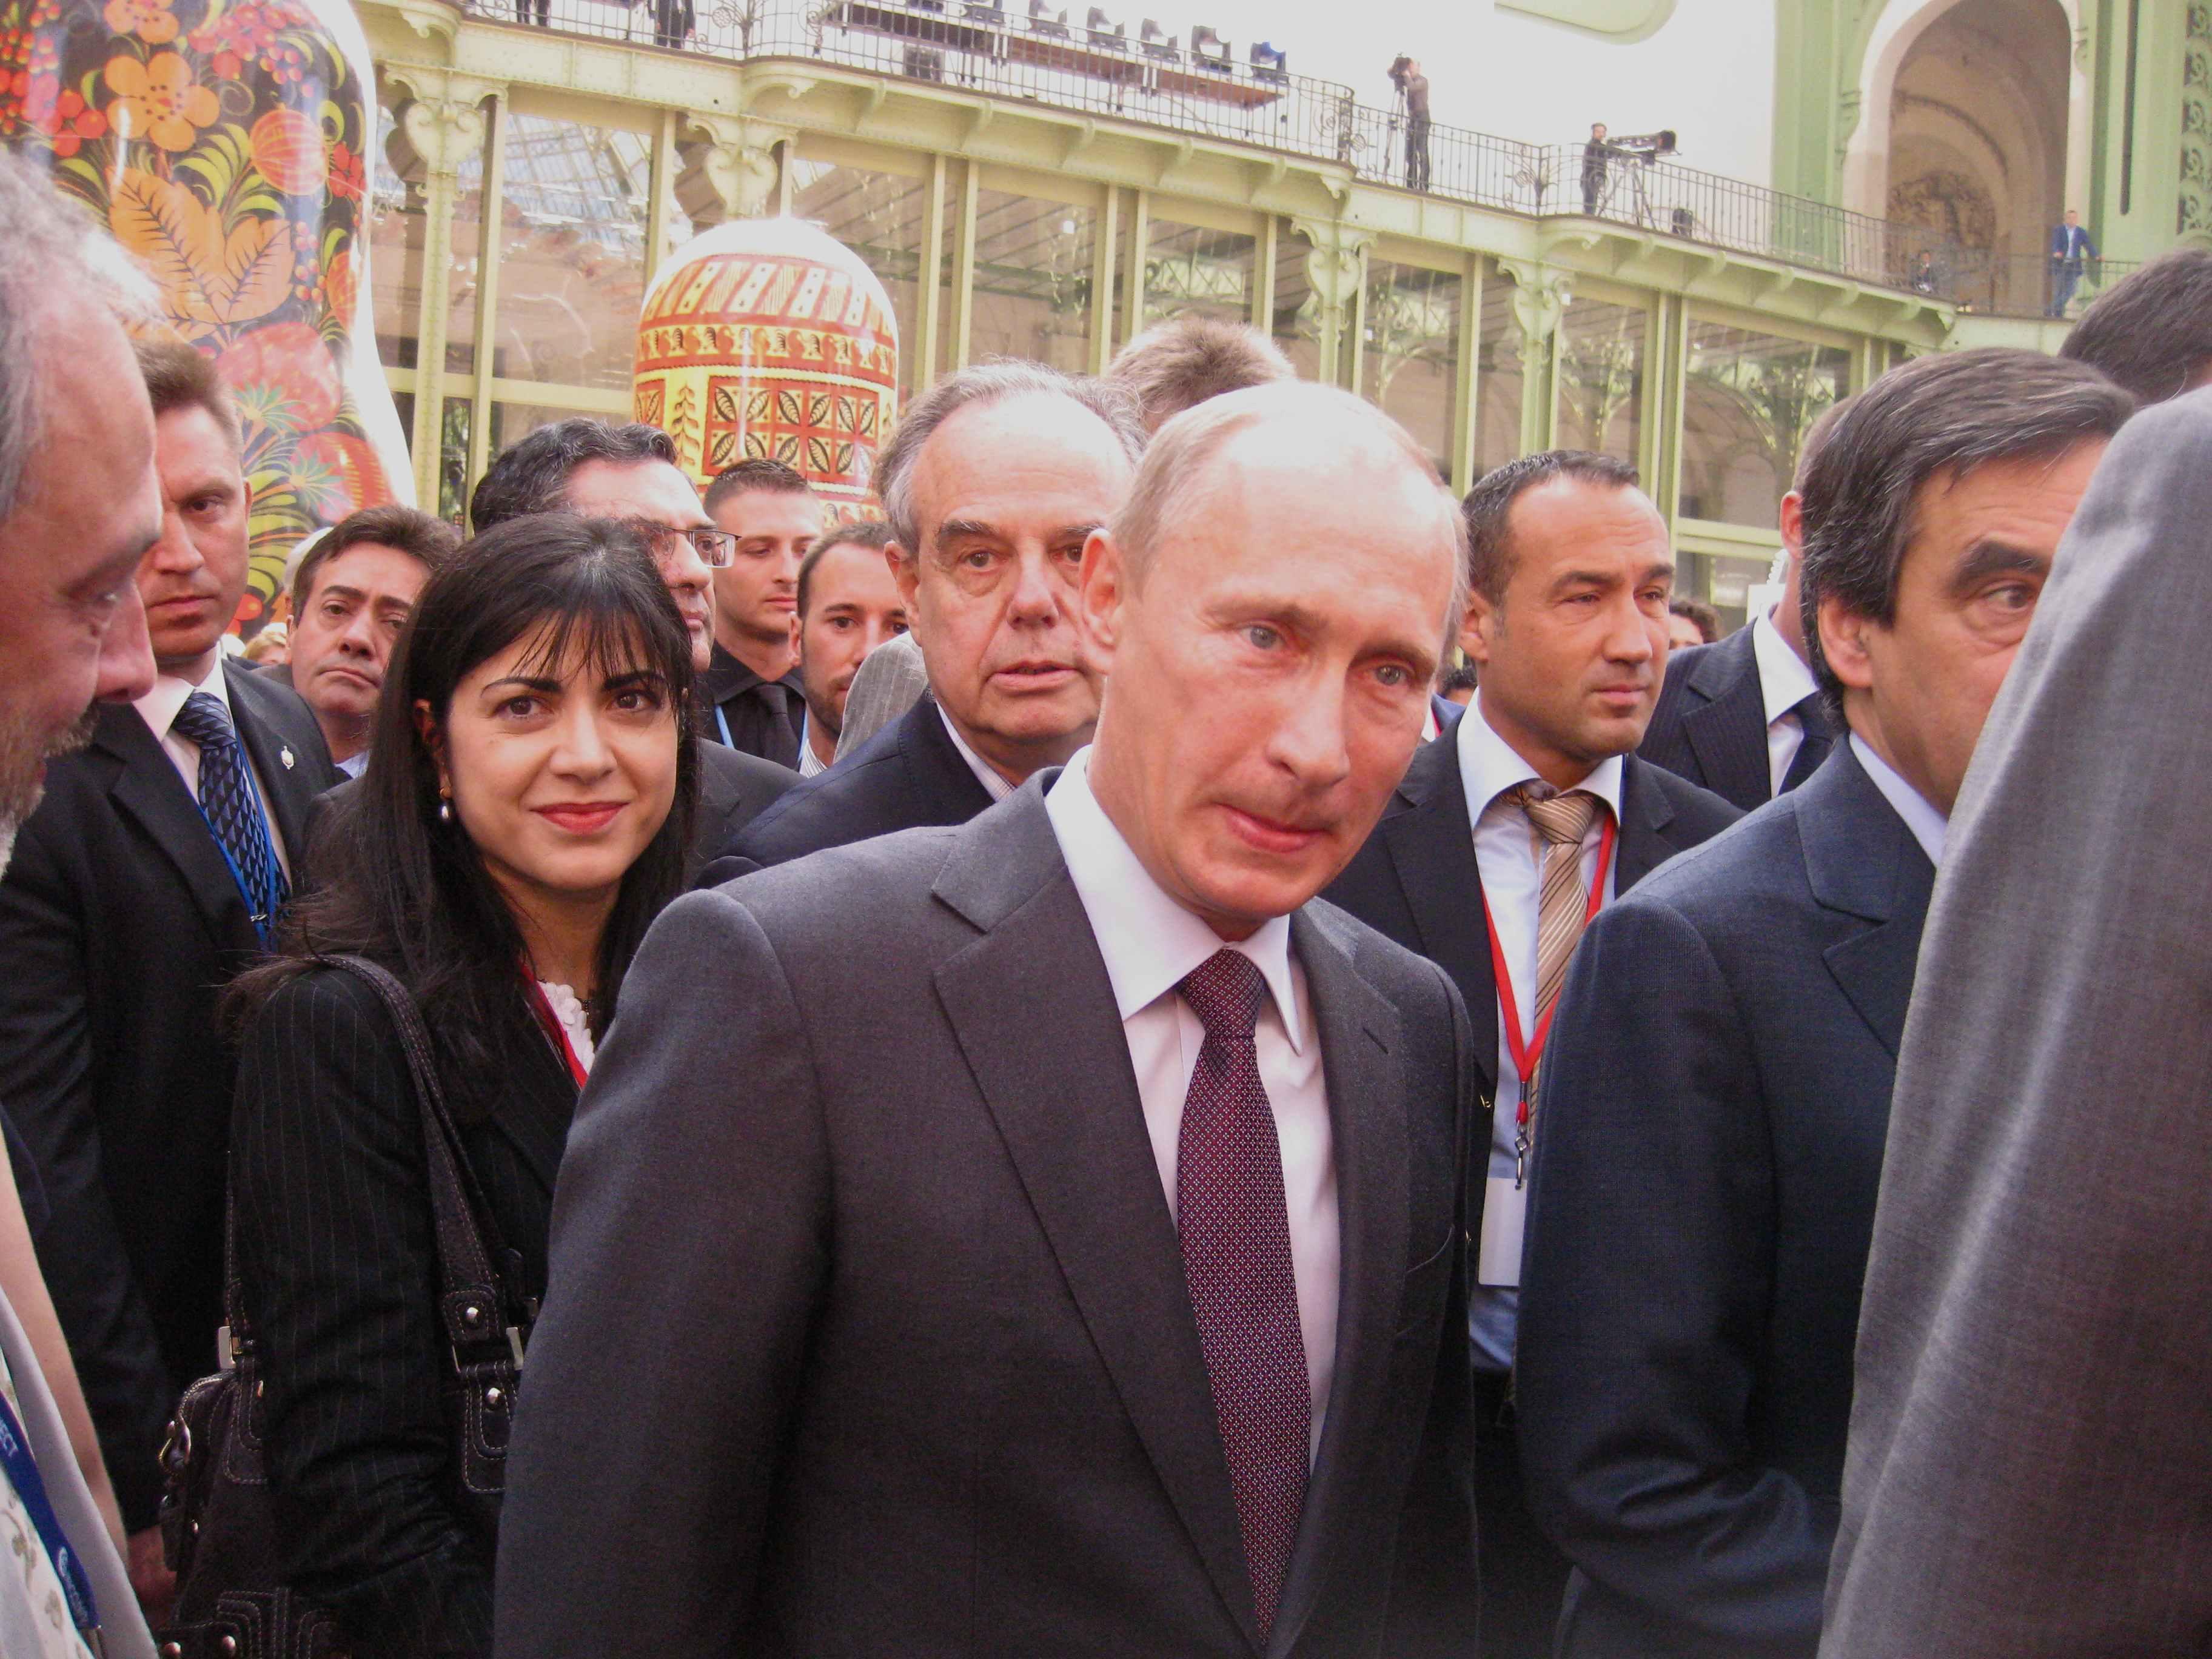 Rencontre franco russe nice